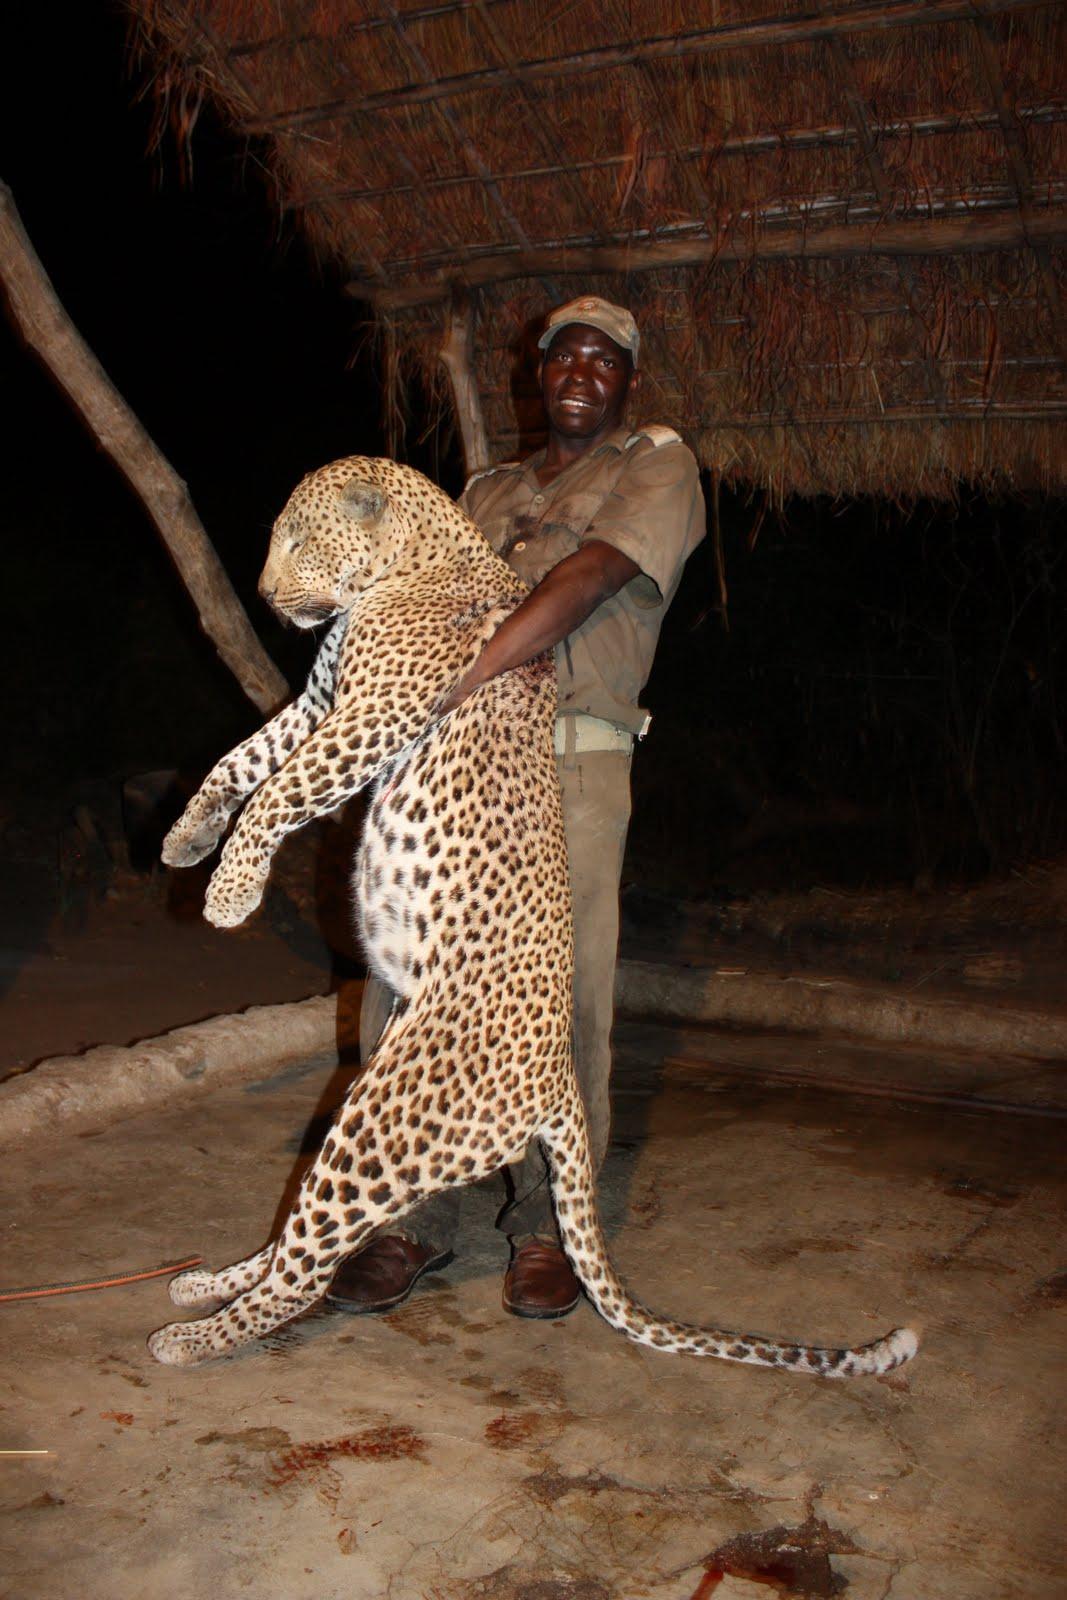 mutant leopards the messybeast - HD1067×1600